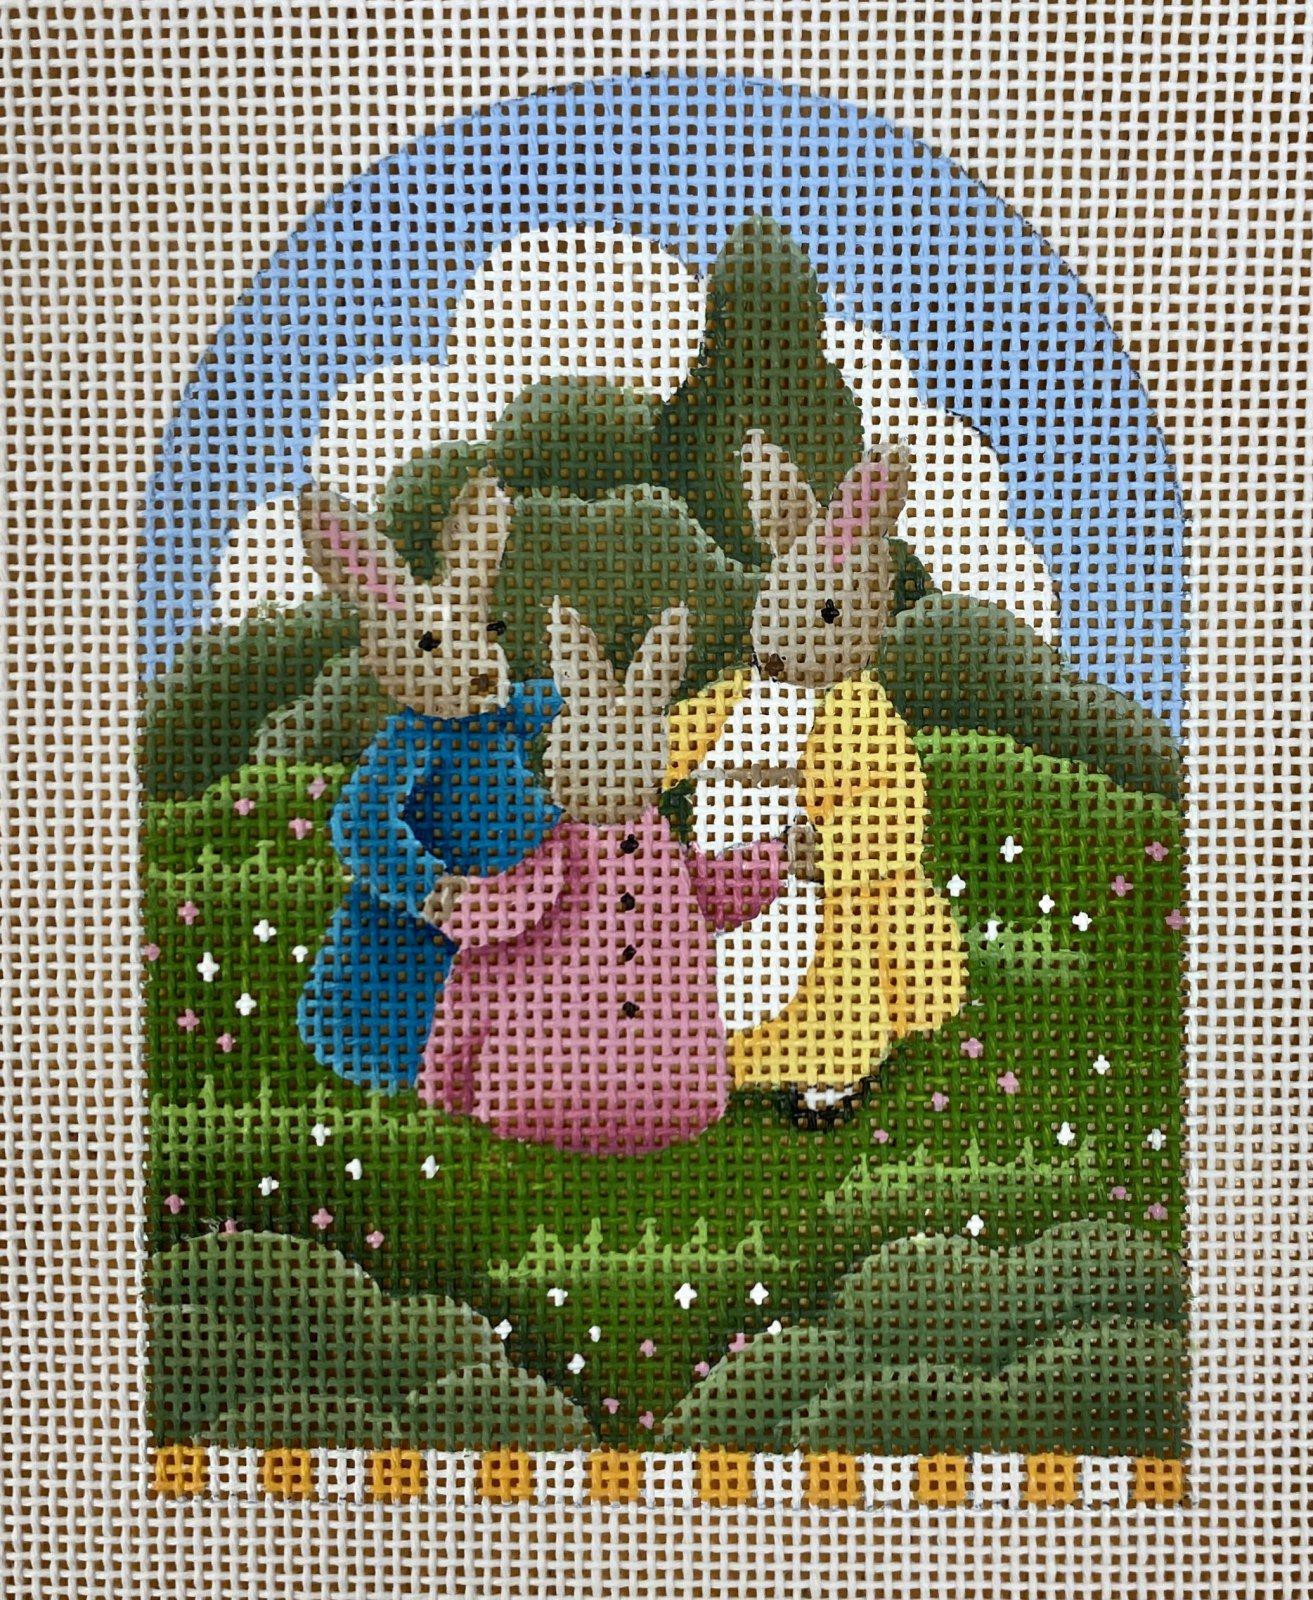 bunny, ring around the rosie